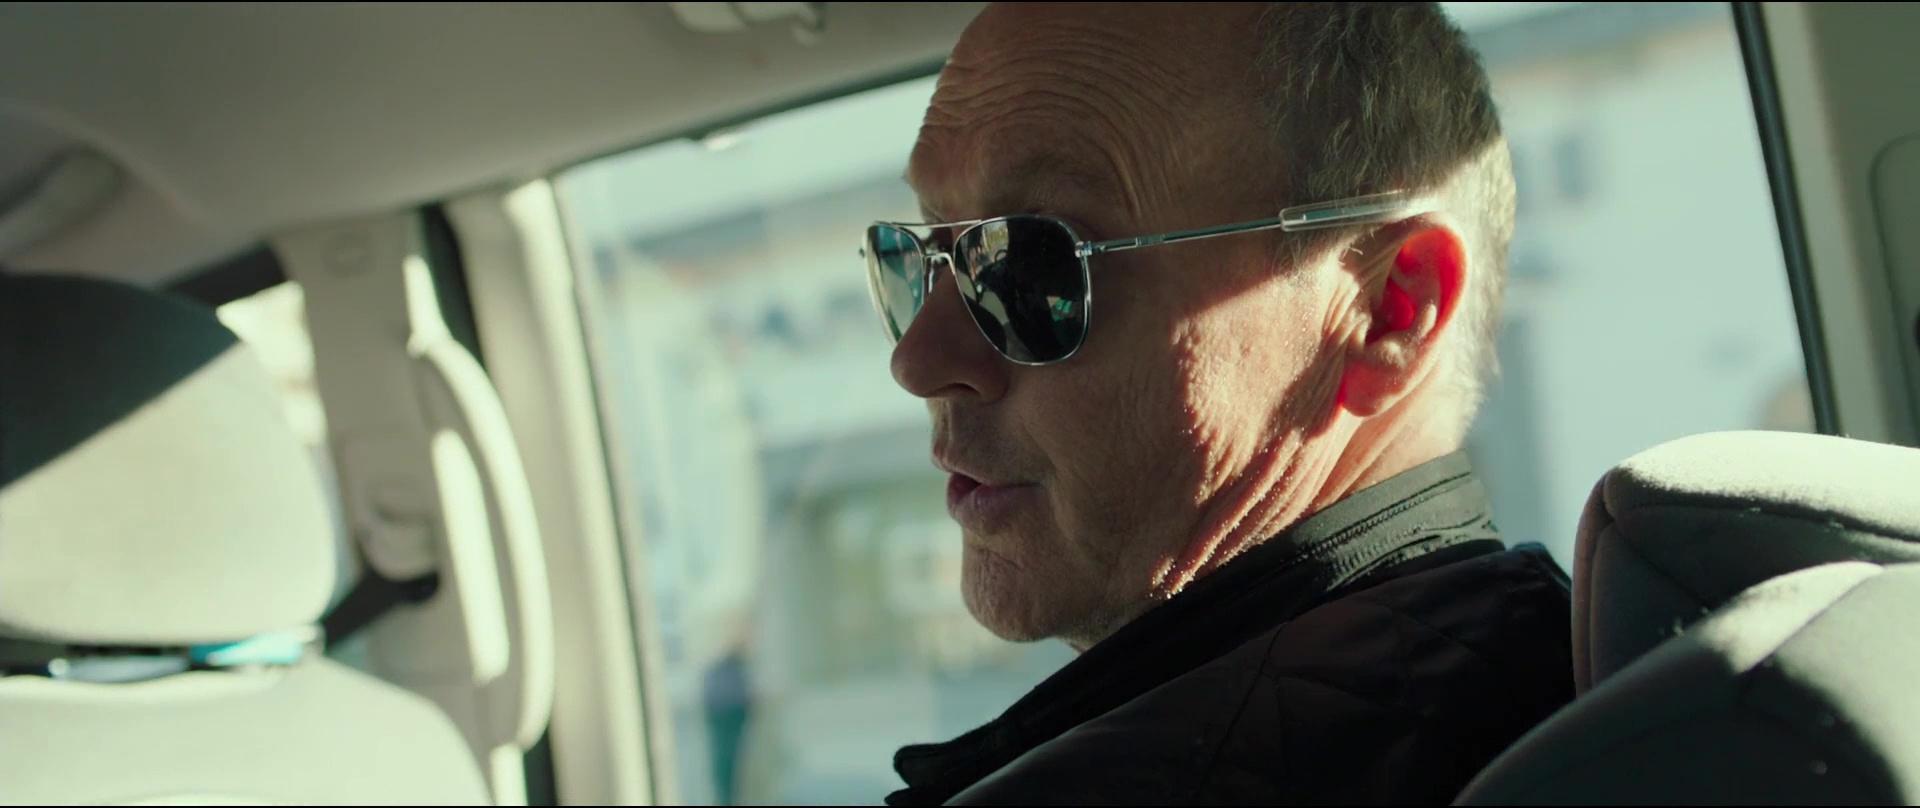 5ad3ecb530e3 Randolph Engineering Aviator Sunglasses Worn by Michael Keaton in American  Assassin (2017) Movie Product